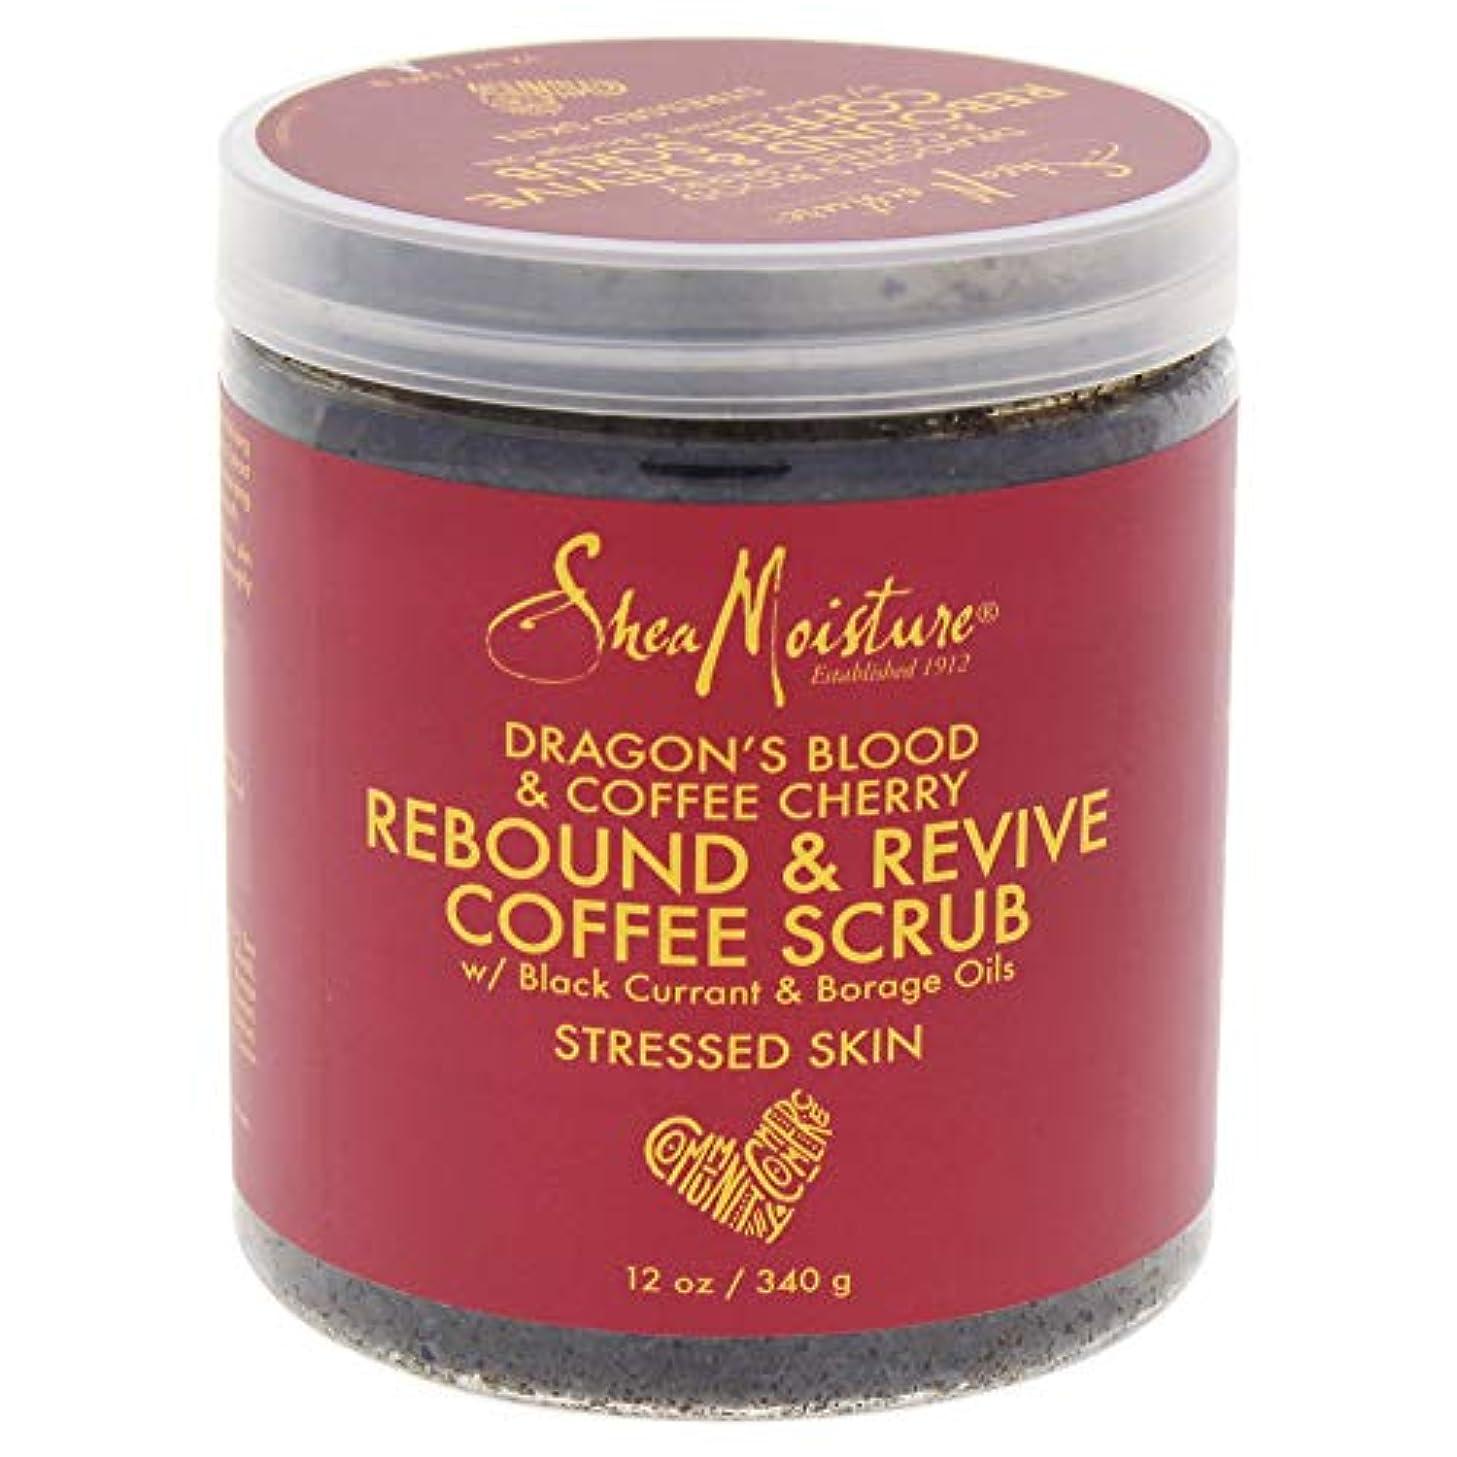 浅い確率怠感Dragons Blood & Coffee Cherry Rebound & Revive Coffee Scrub